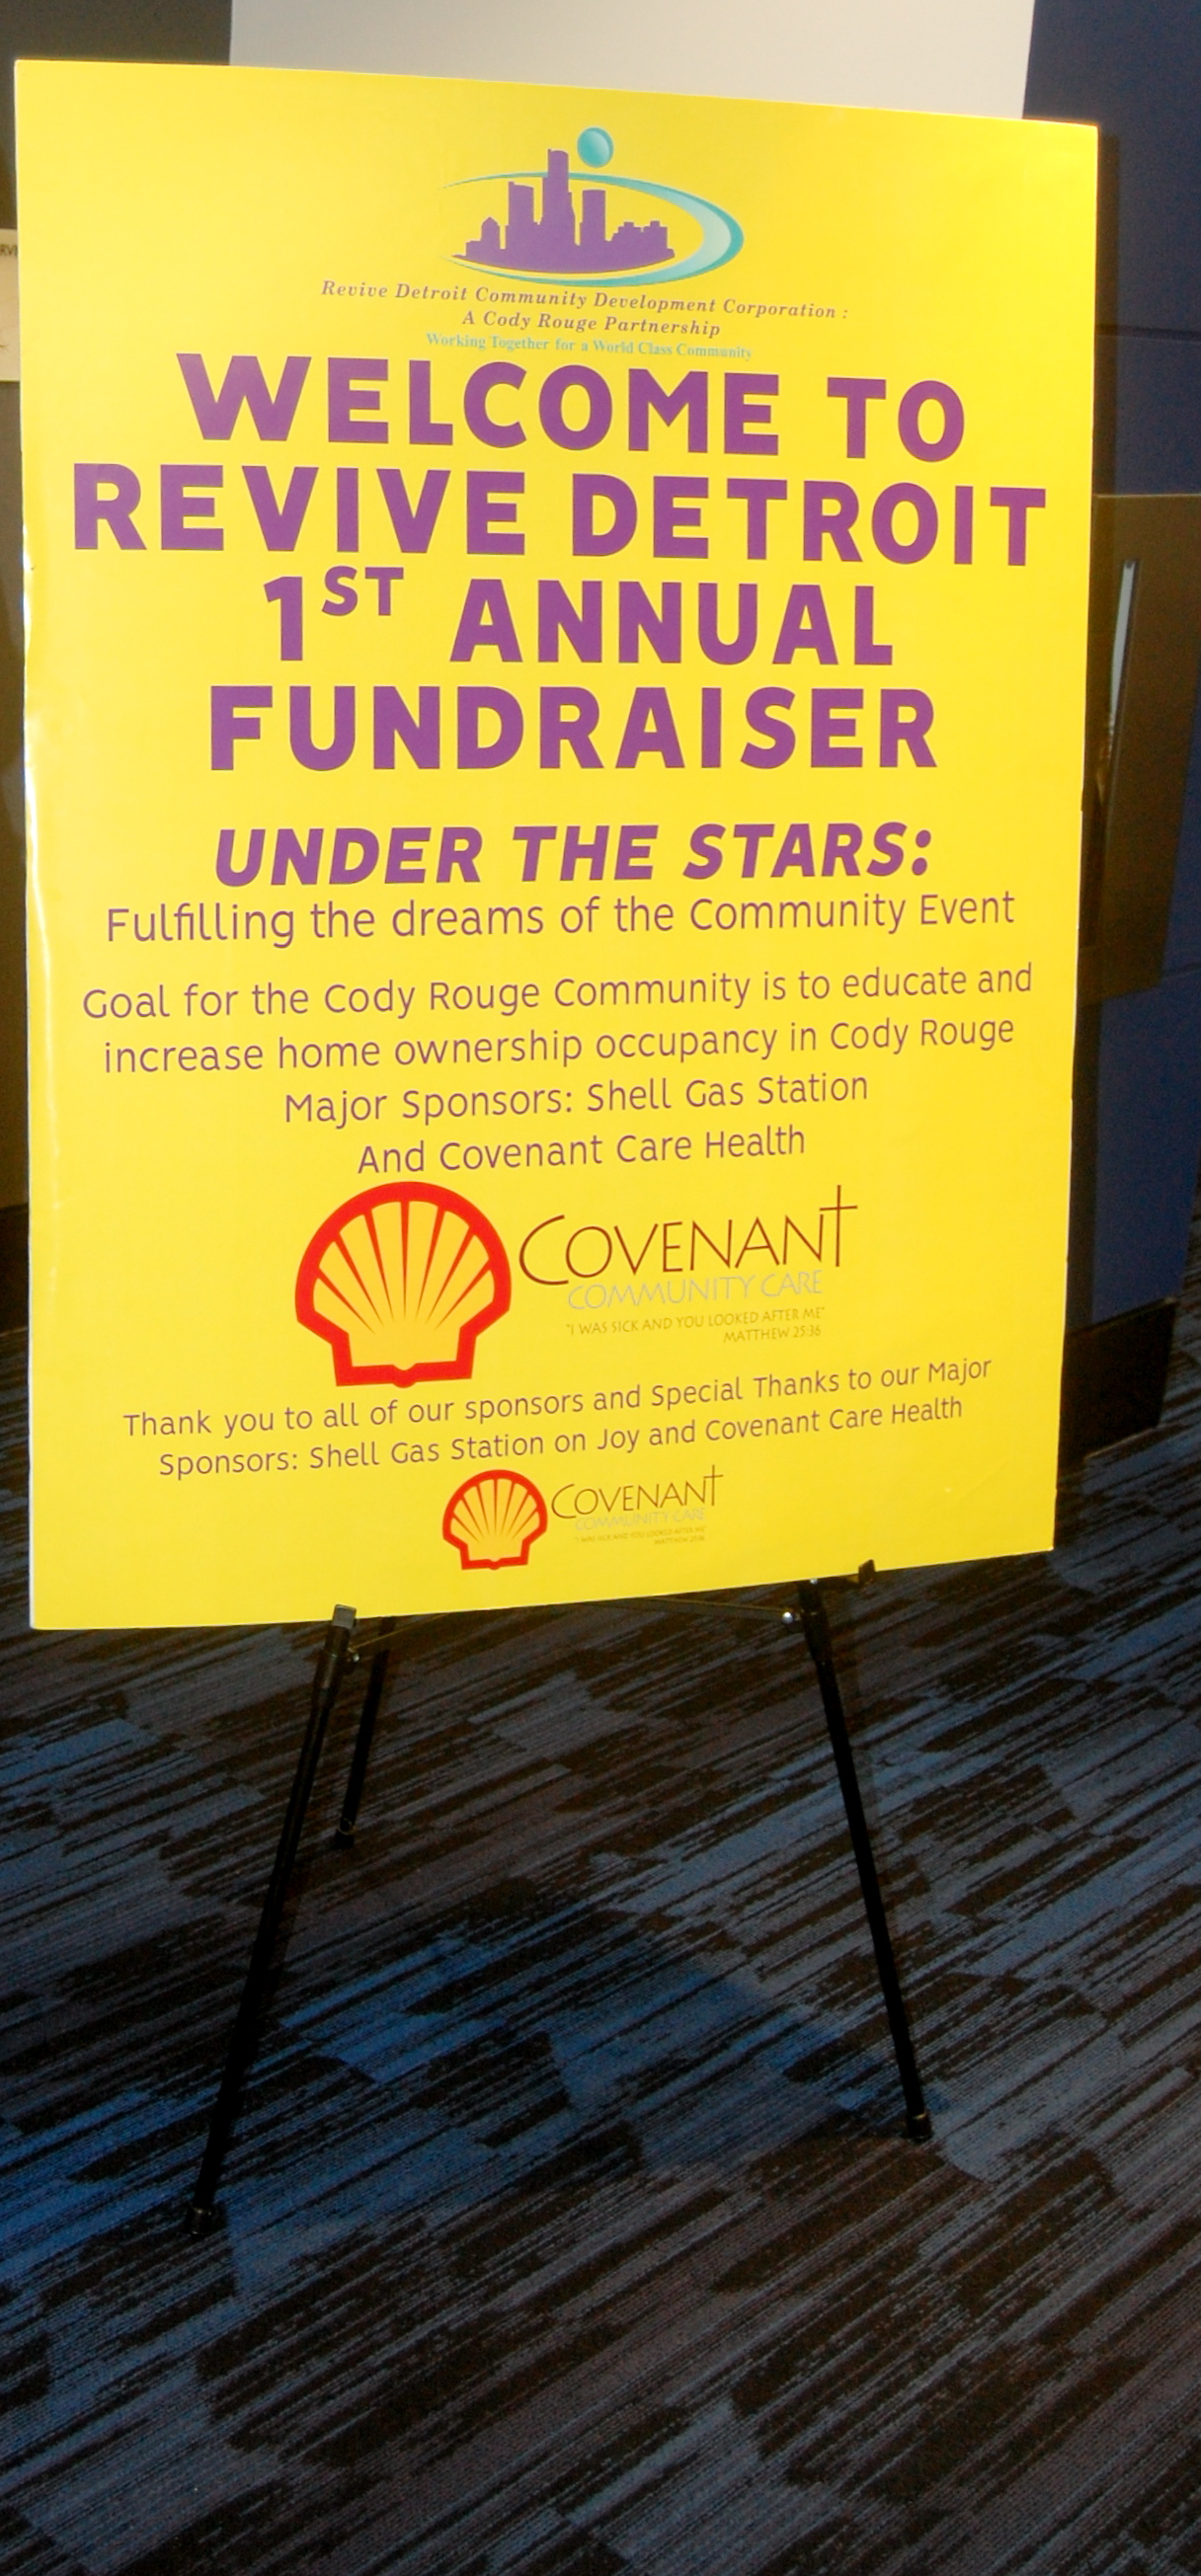 1st Annual Fundraiser